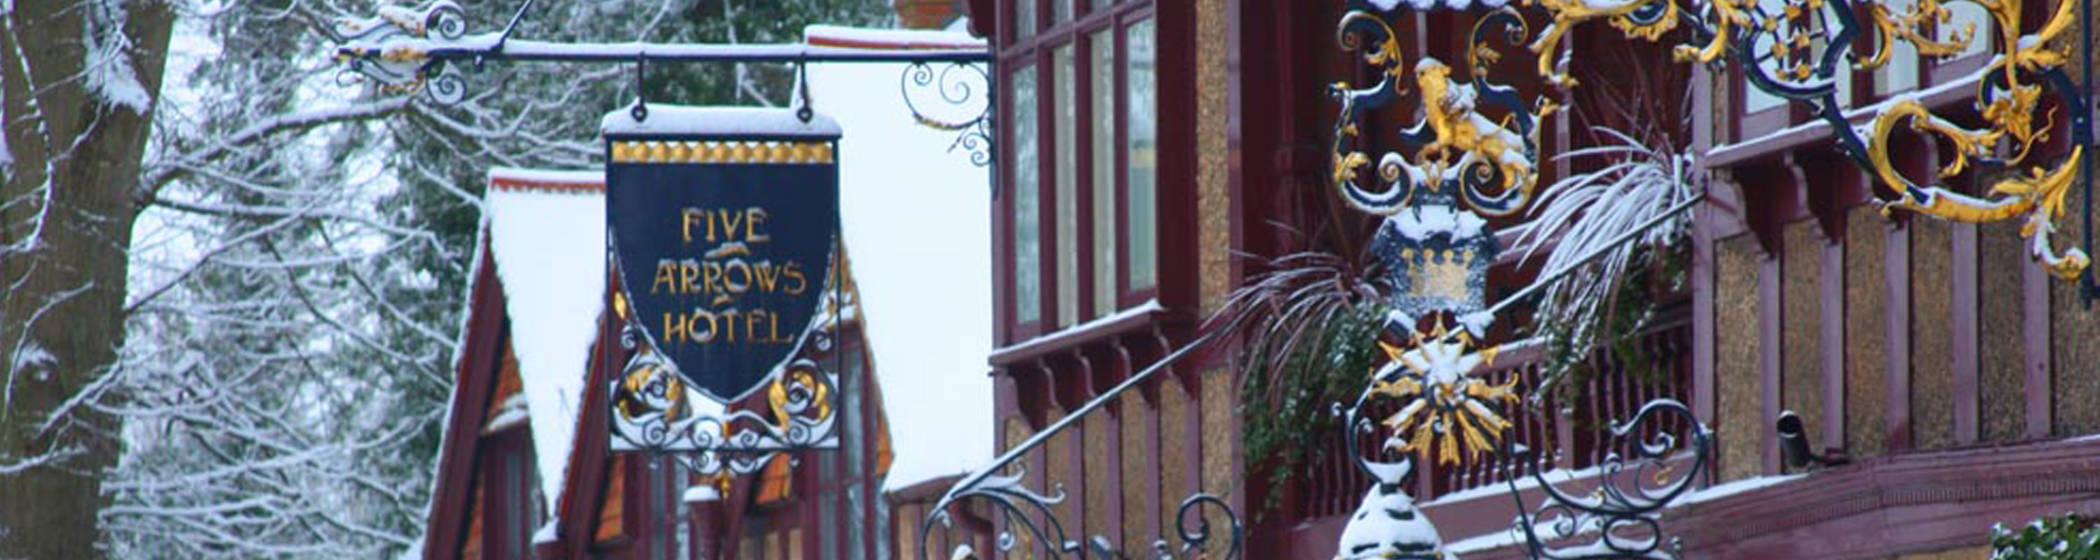 Five arrow hotel exterior at christmas